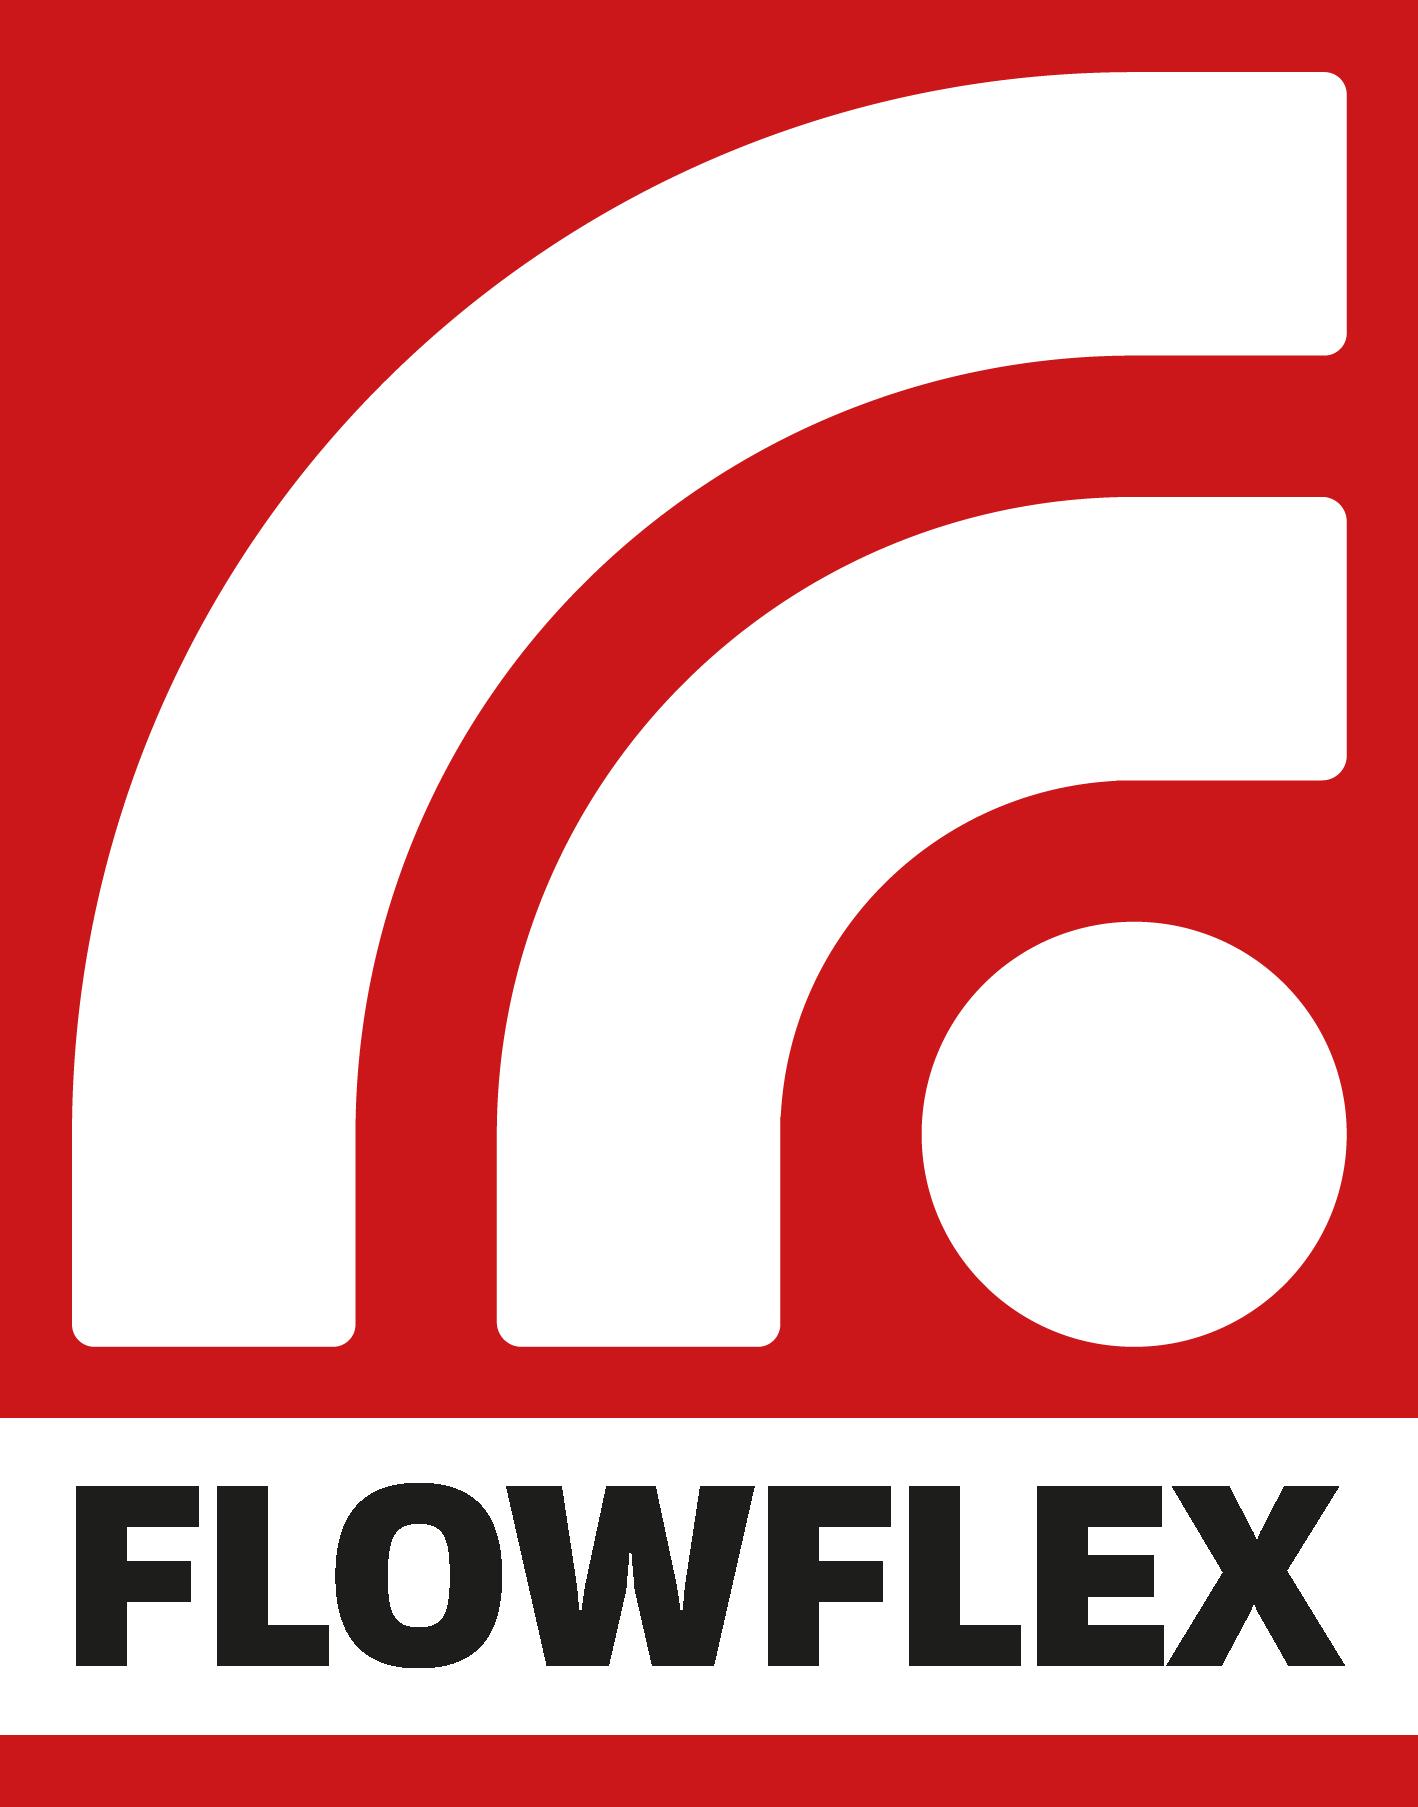 FlowFlex